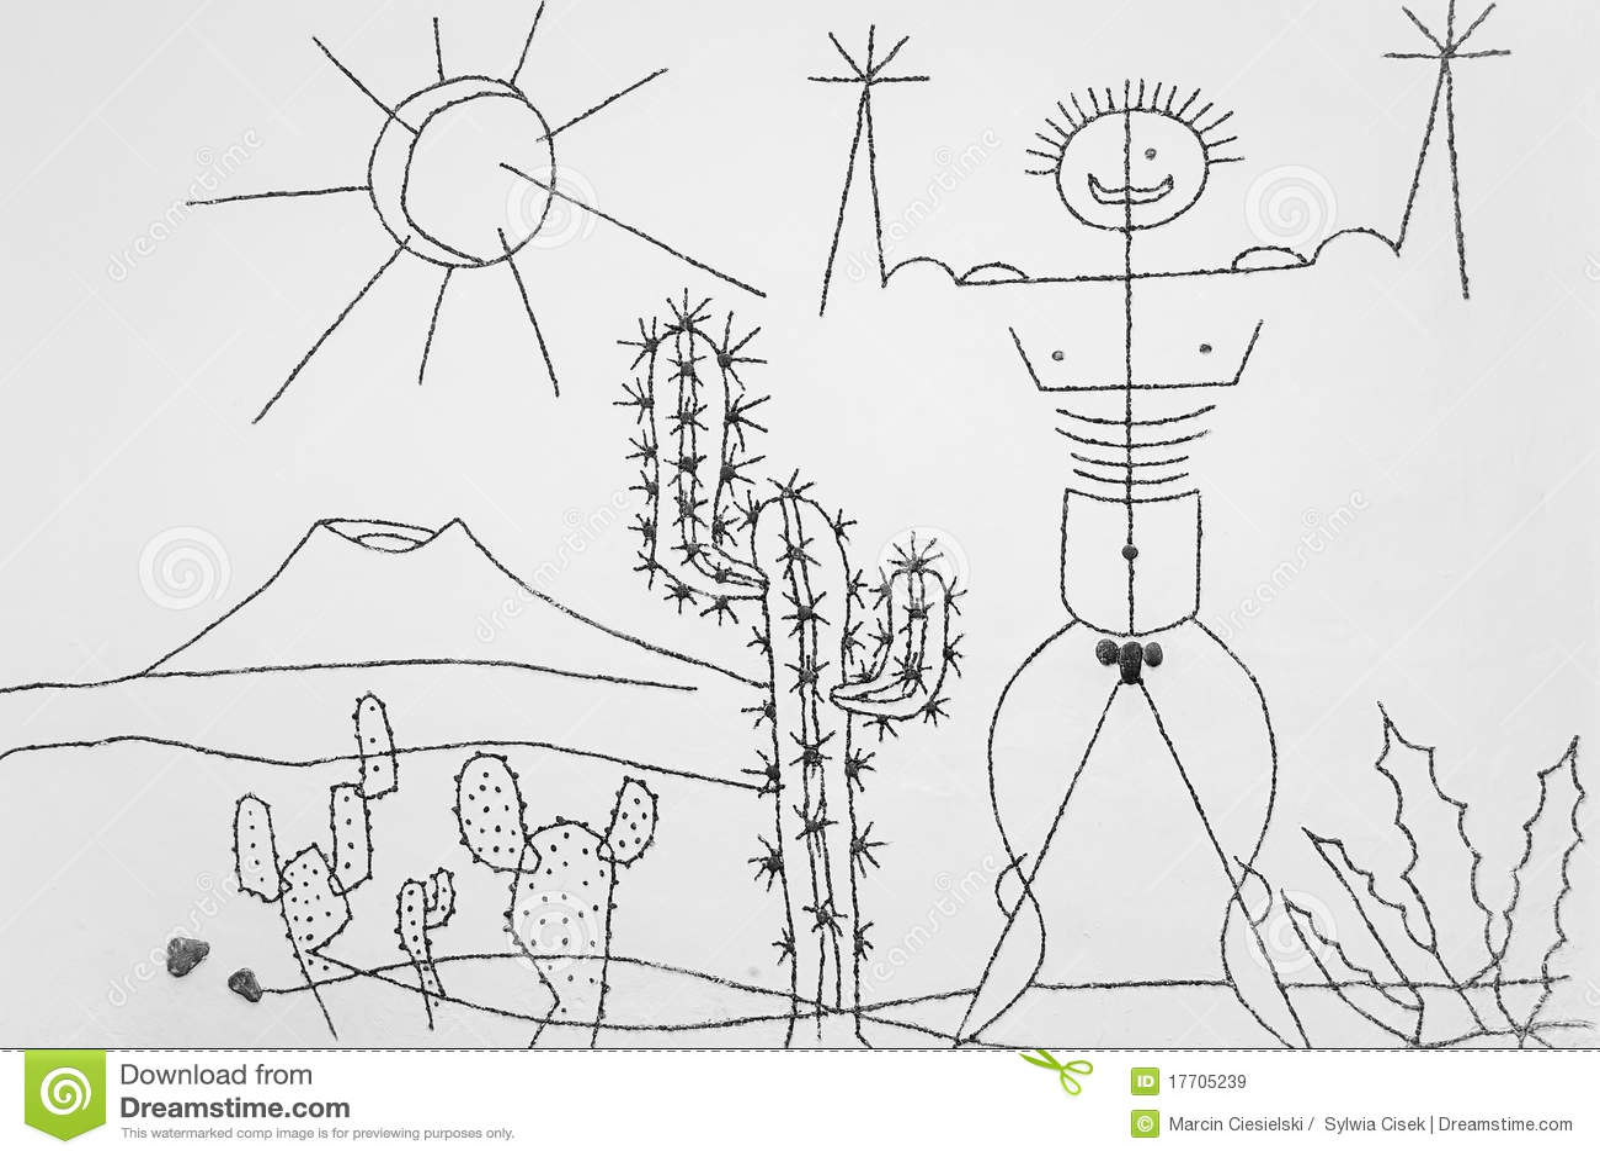 Manrique S Art In Jardin De Cactus Editorial Stock Image Image Of